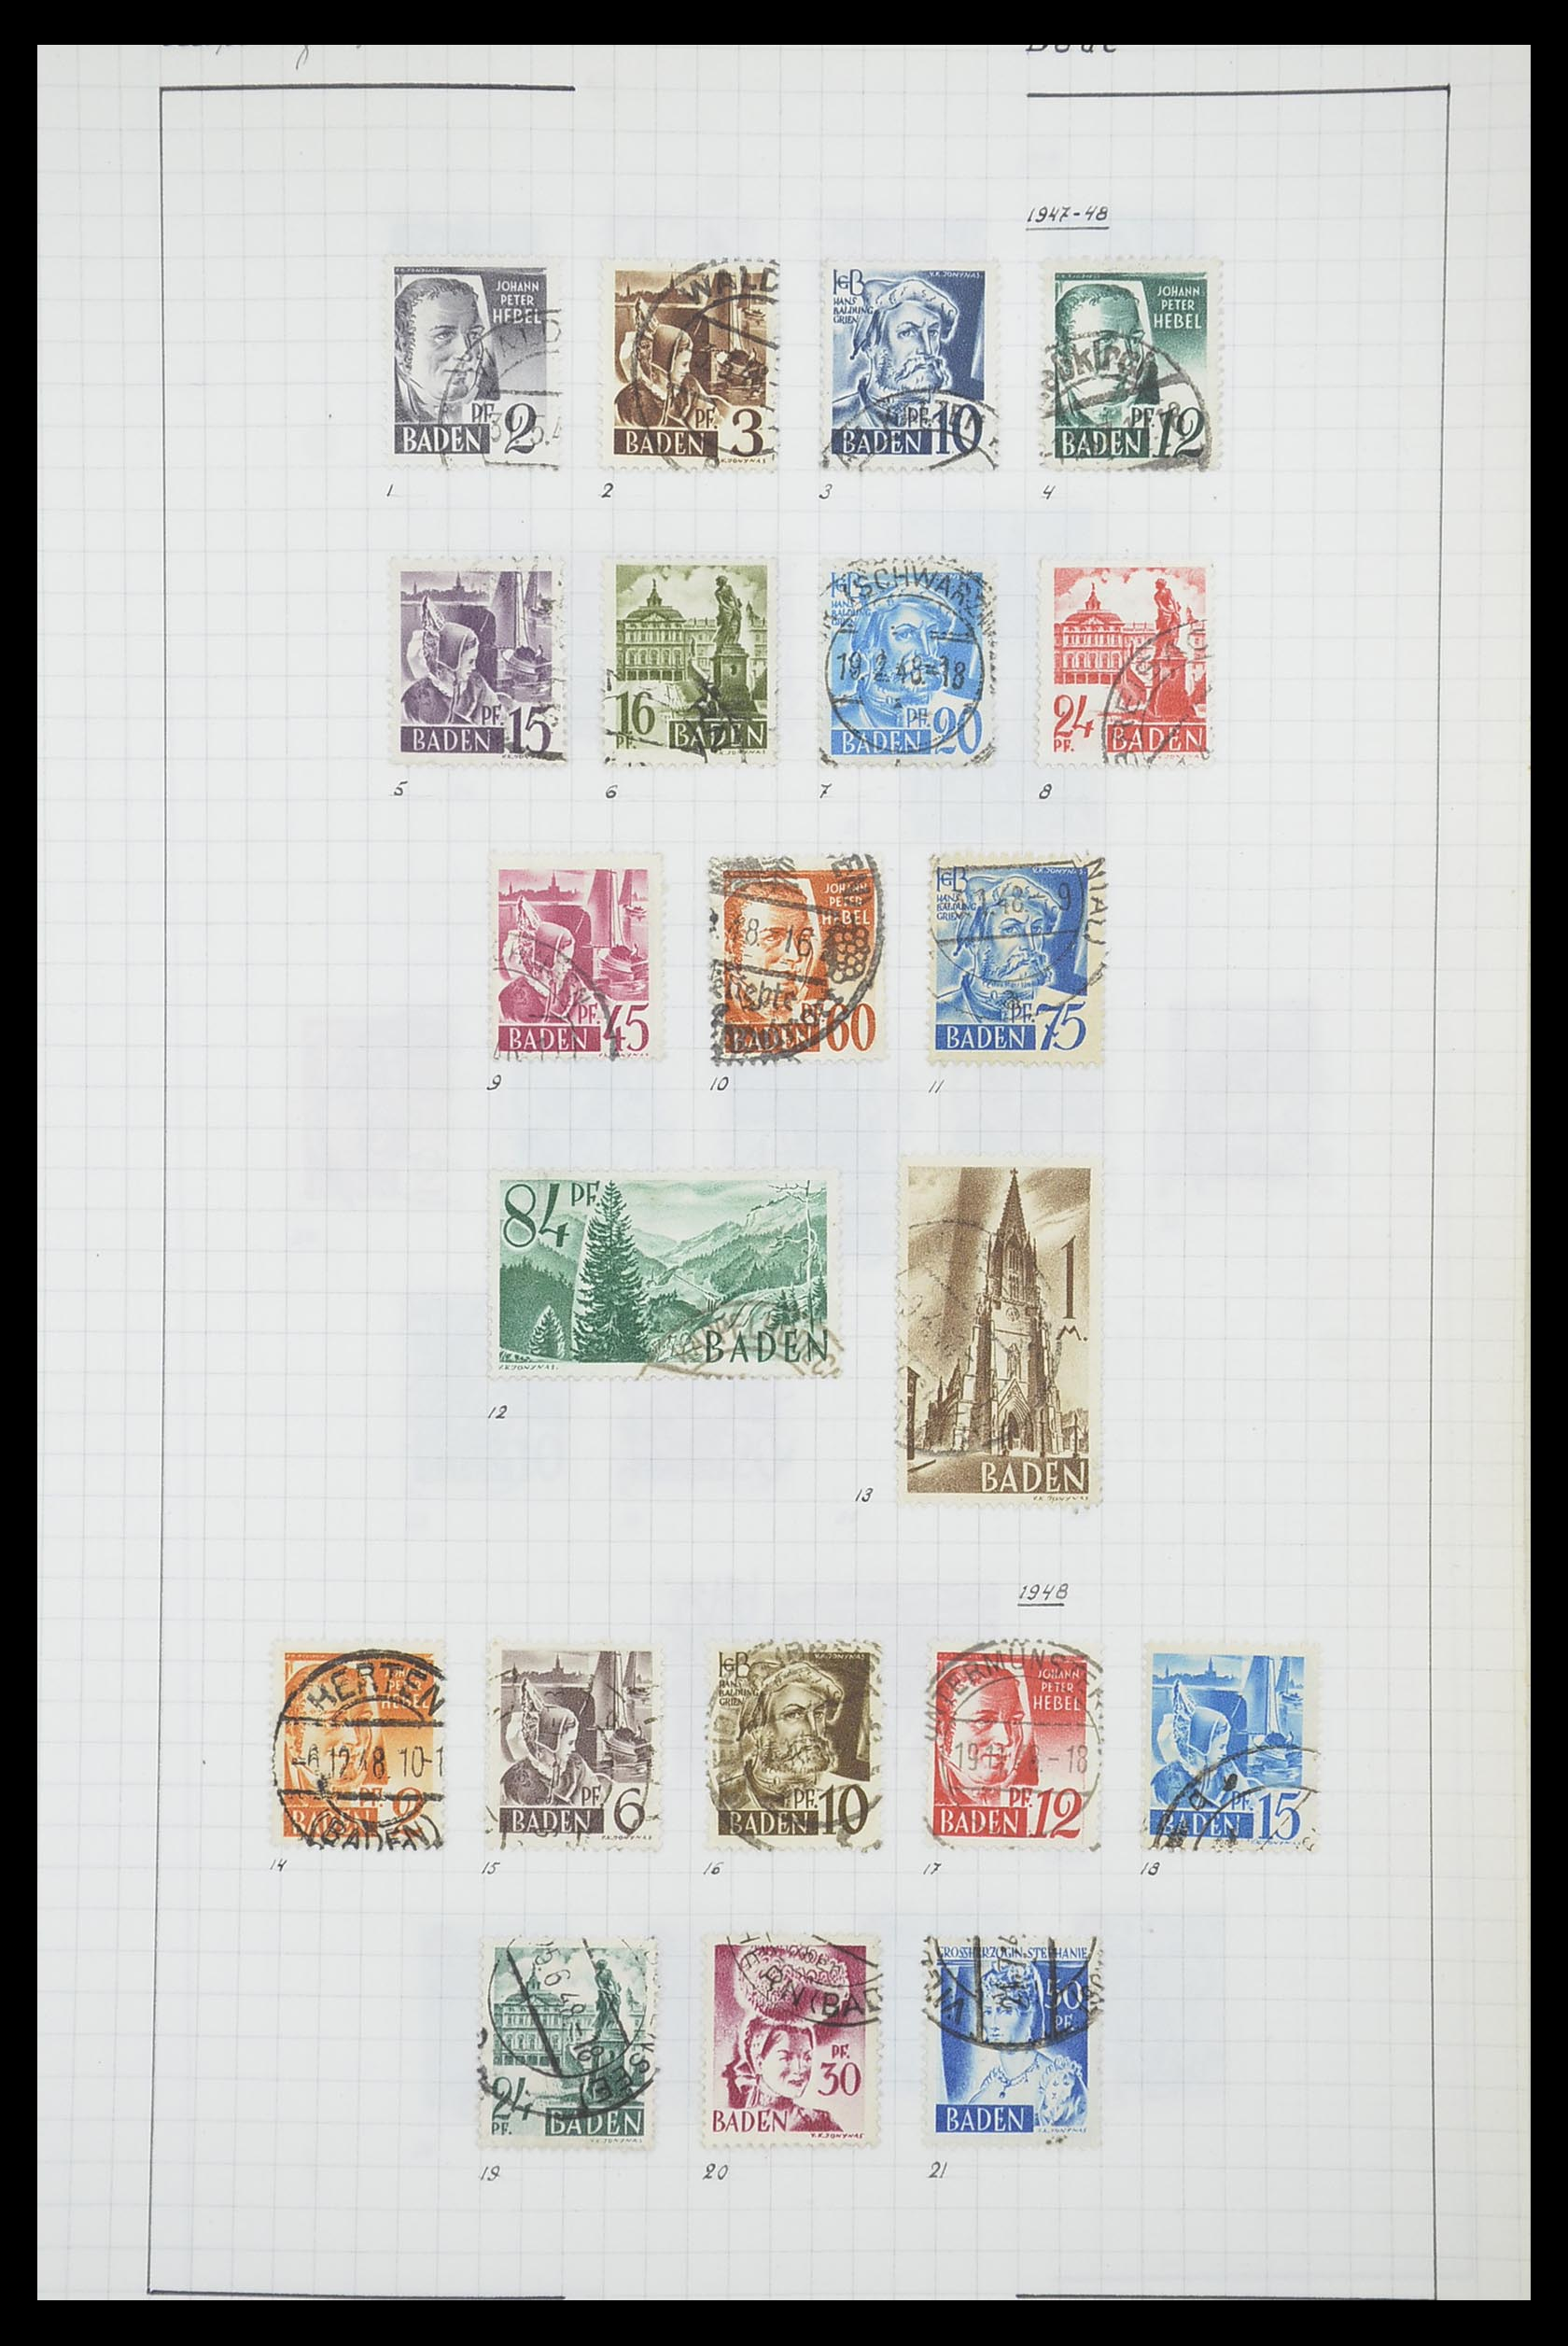 33864 007 - Postzegelverzameling 33864 Franse Zone 1945-1949.